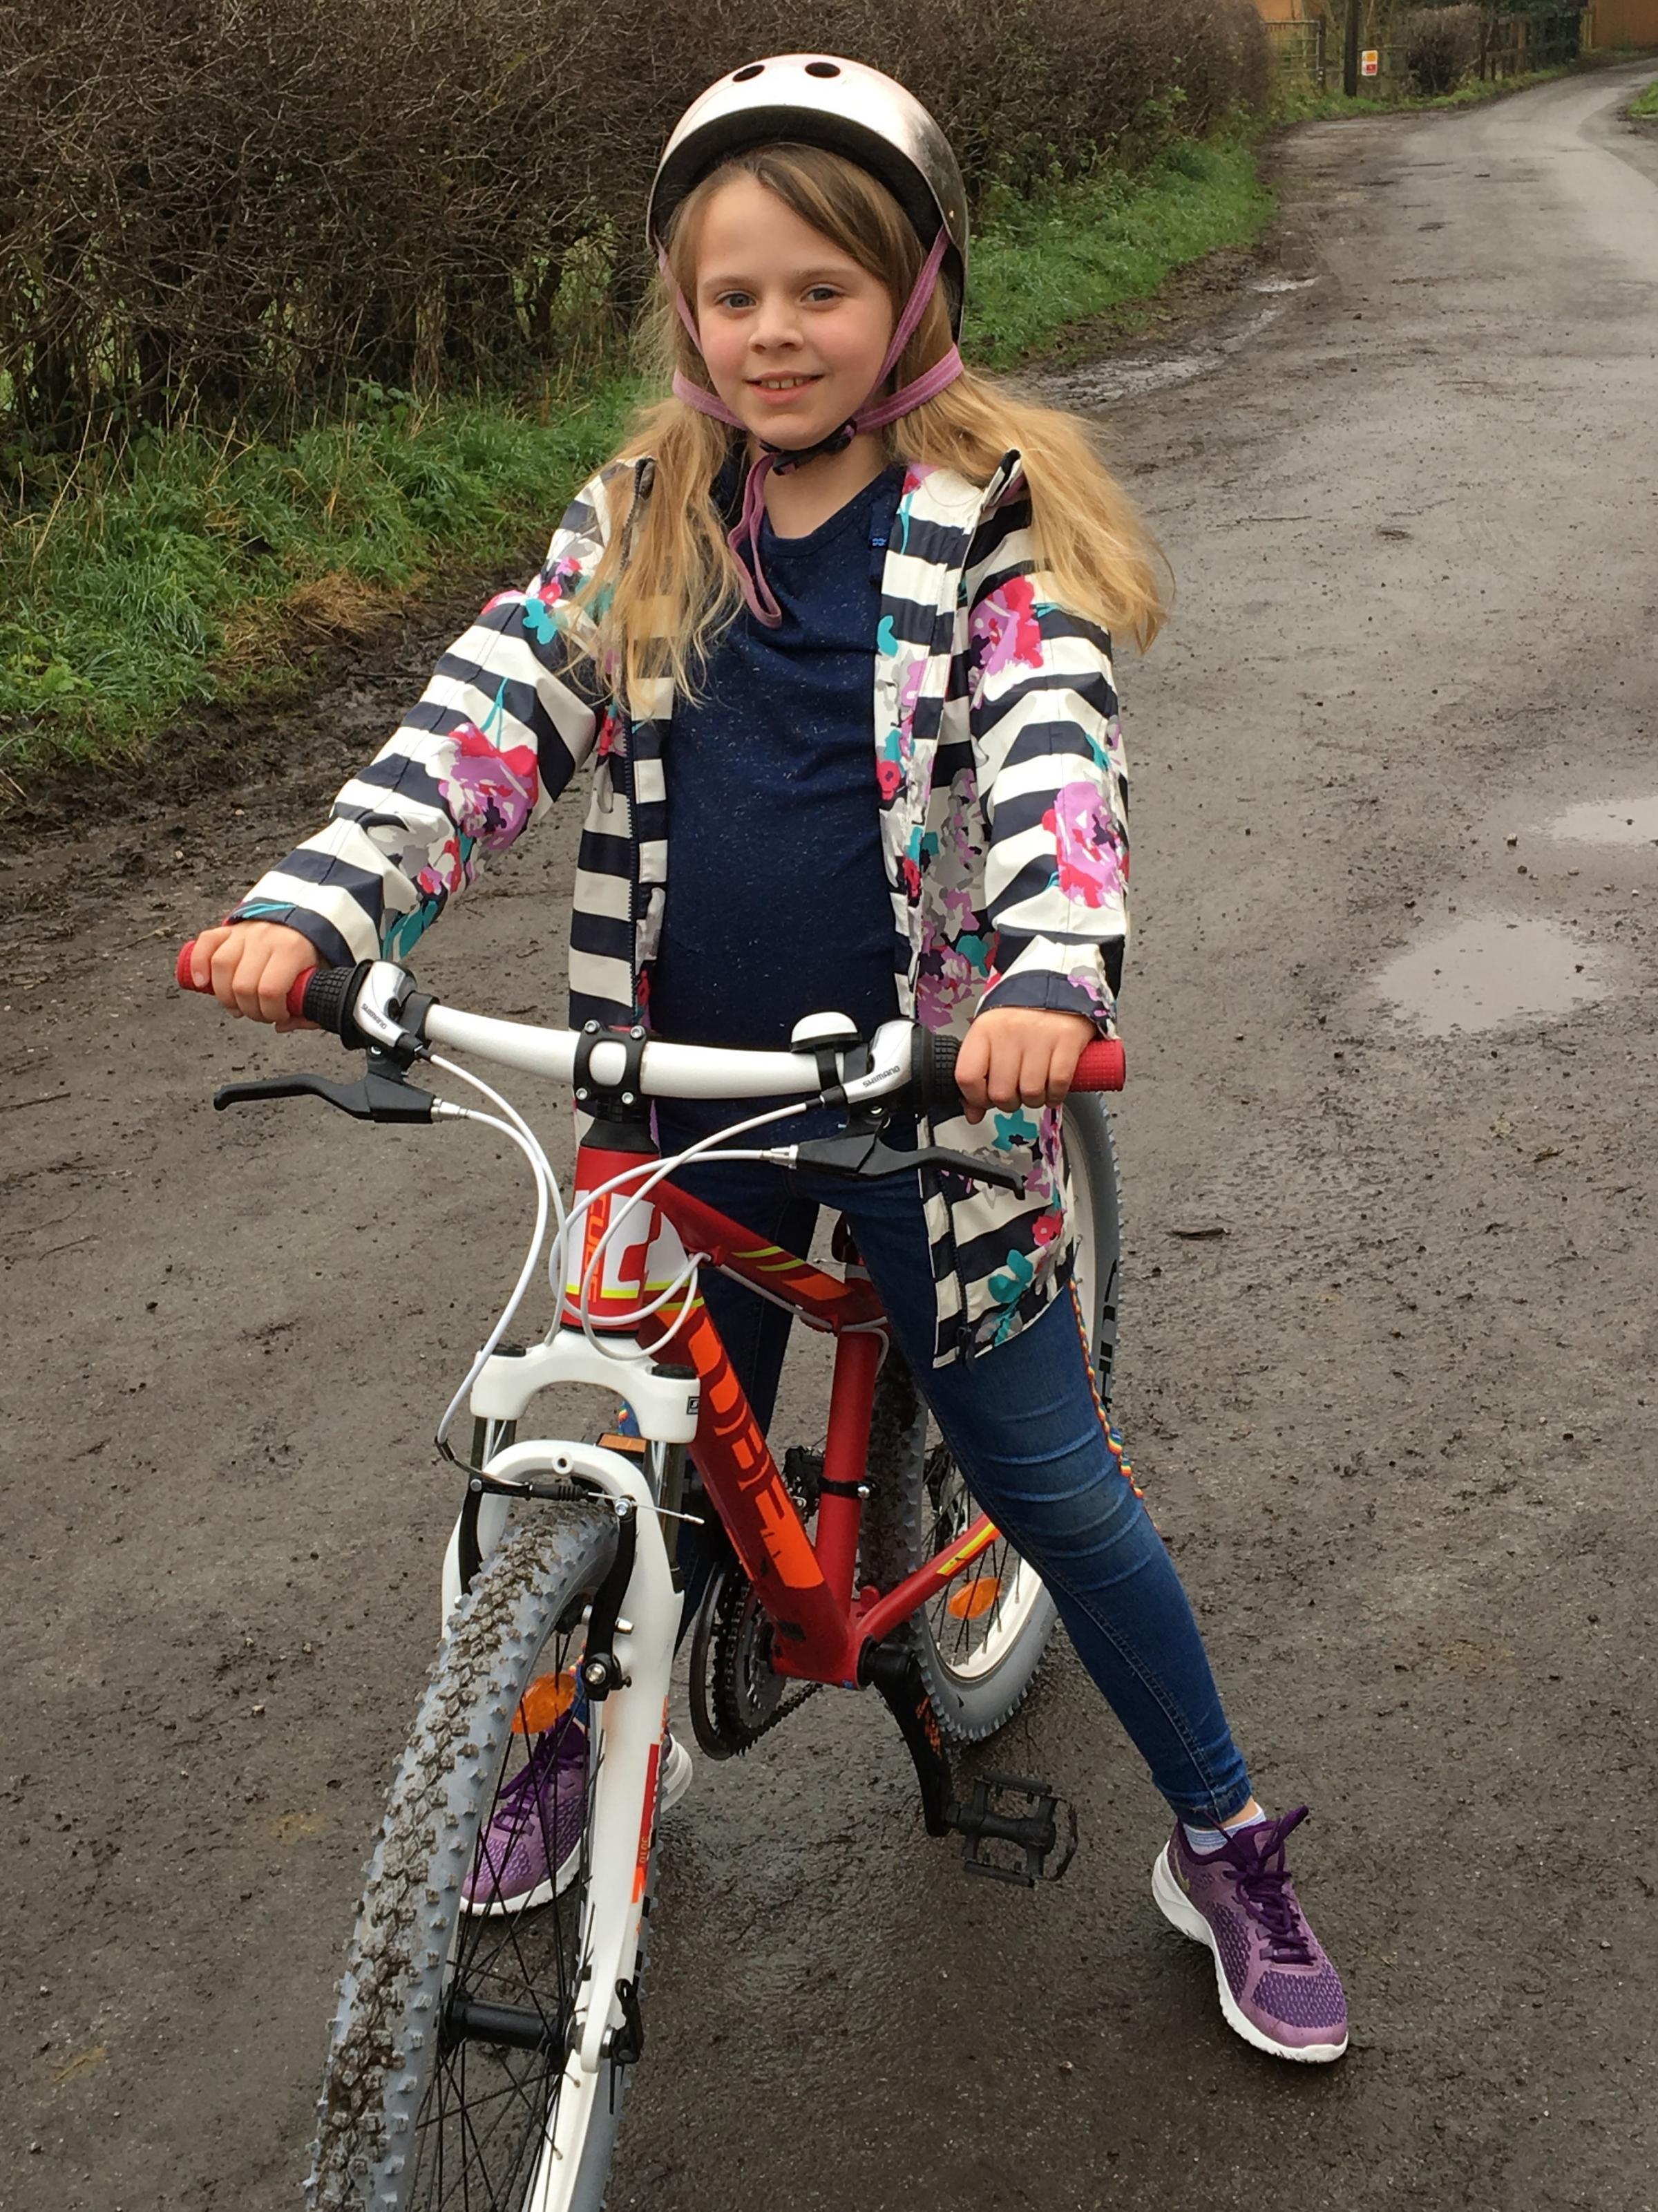 Lymm schoolgirl wins national competition for designing helmet so deaf people can stay safe